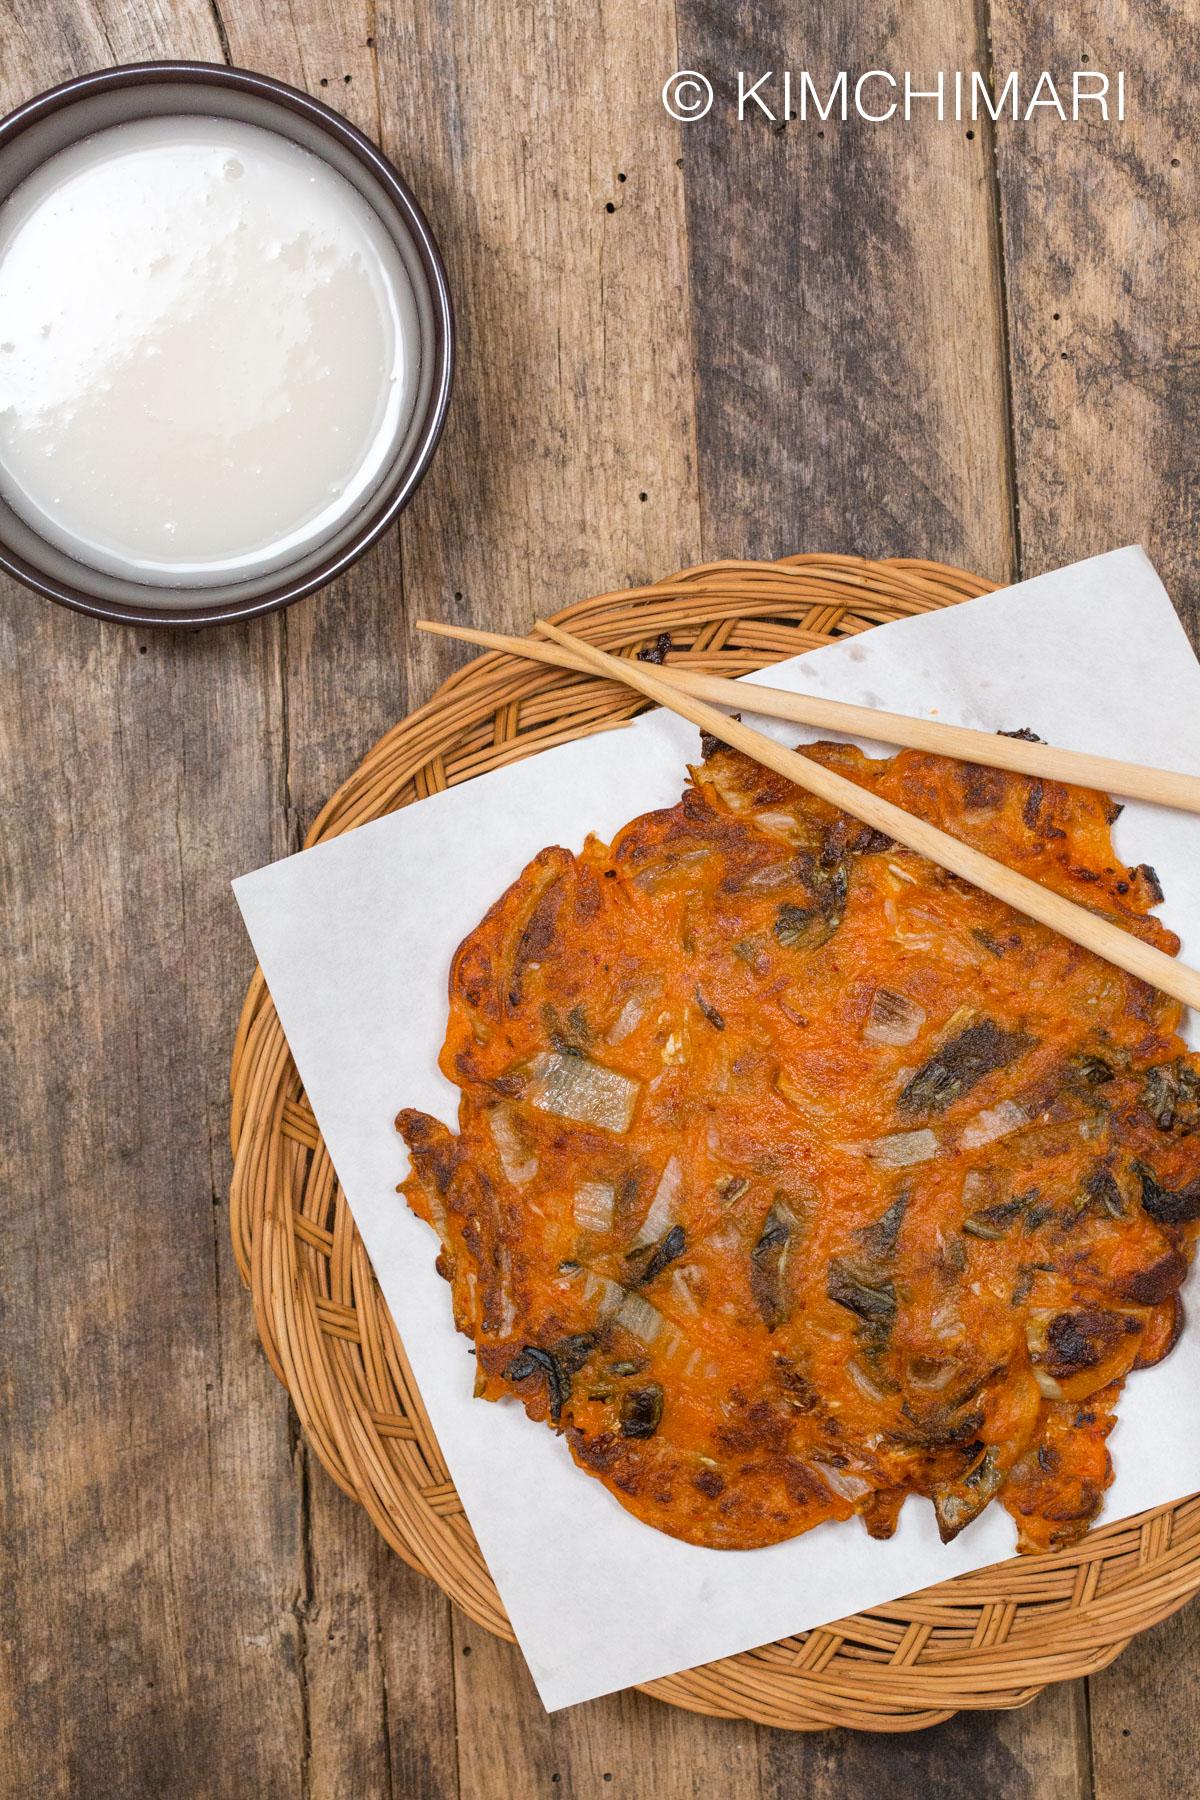 Kimchi Jeon Pancakes with Makgeolli